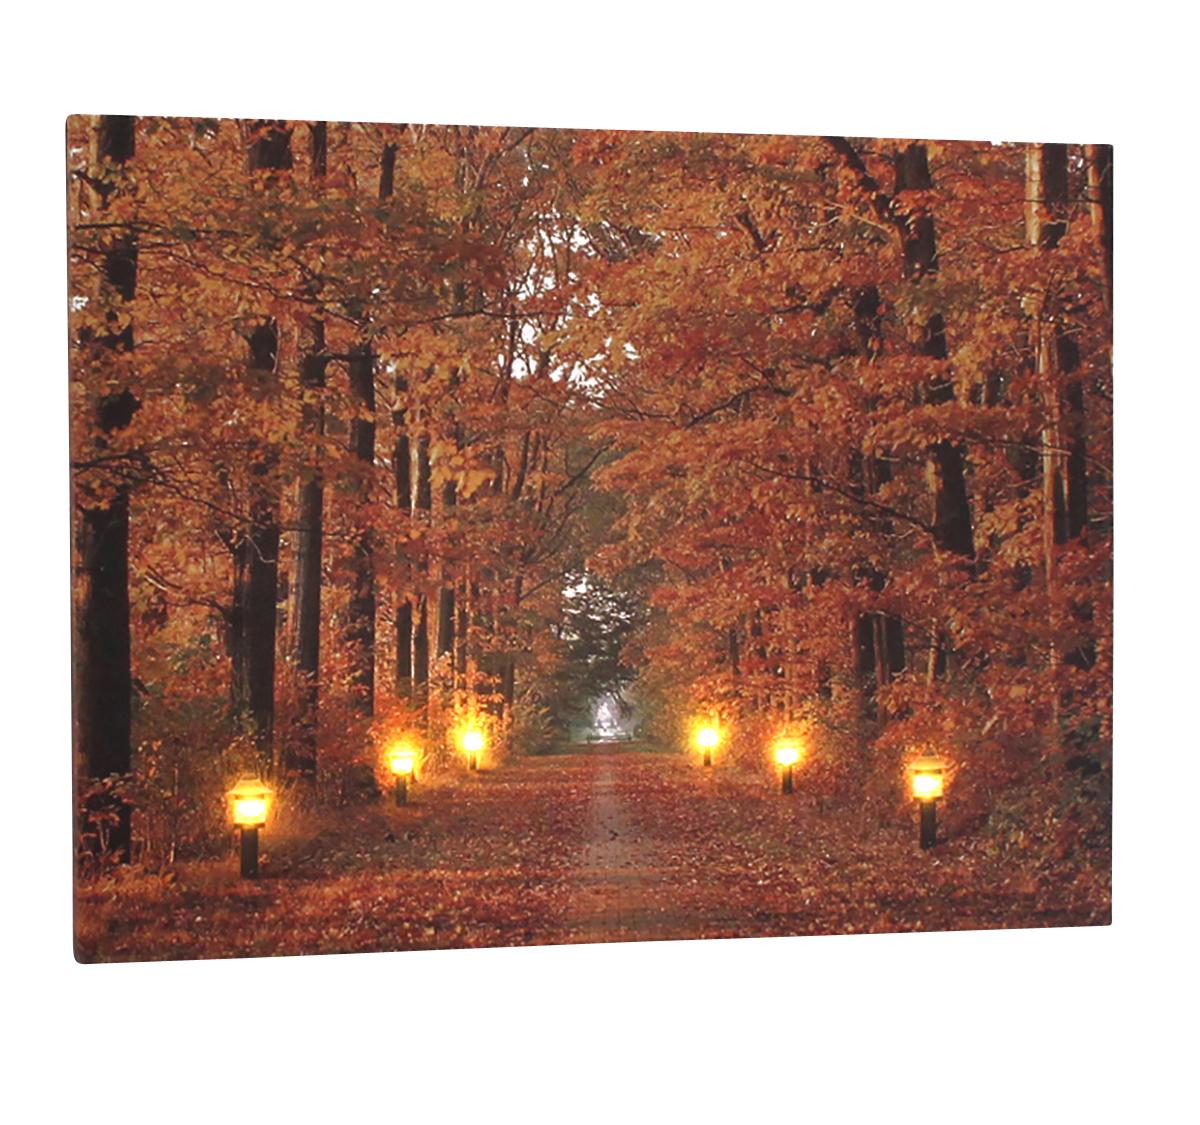 Leinwandbild Mit Led Beleuchtung Wandbild Herbst Mit 6 Laternen